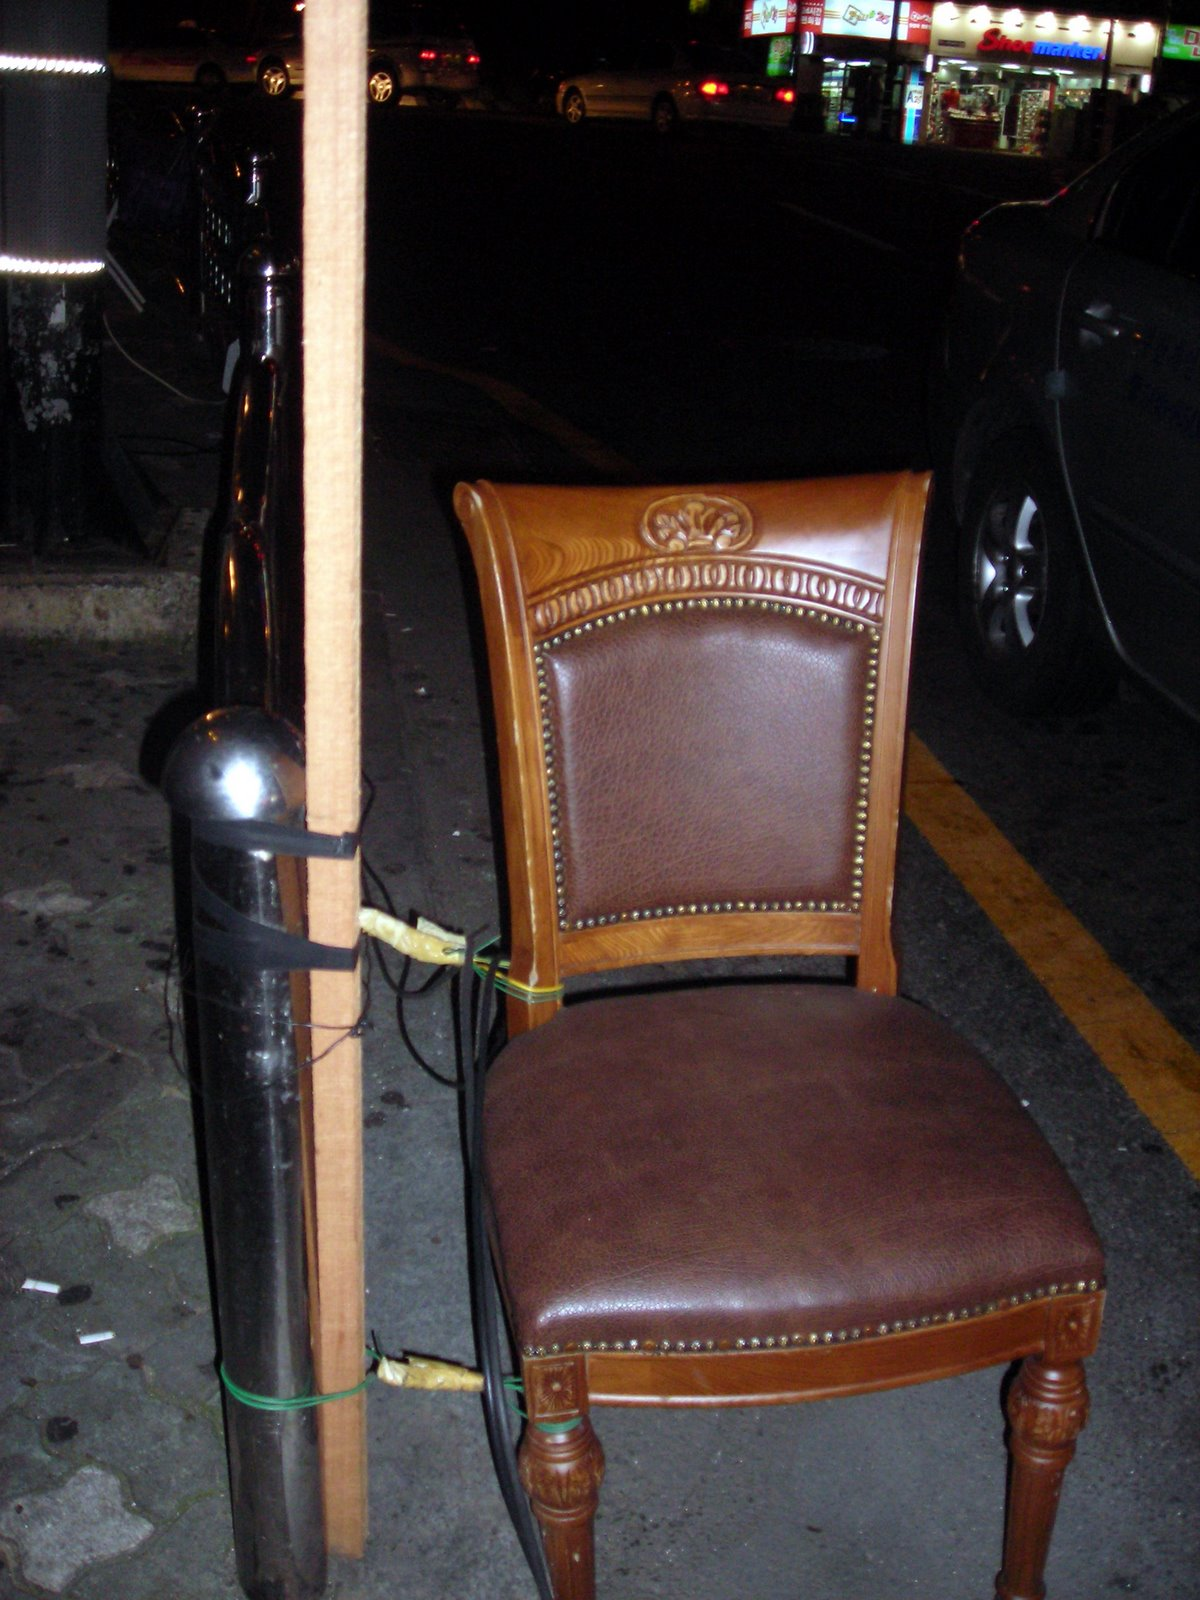 powered by furniture phpbb Bondage